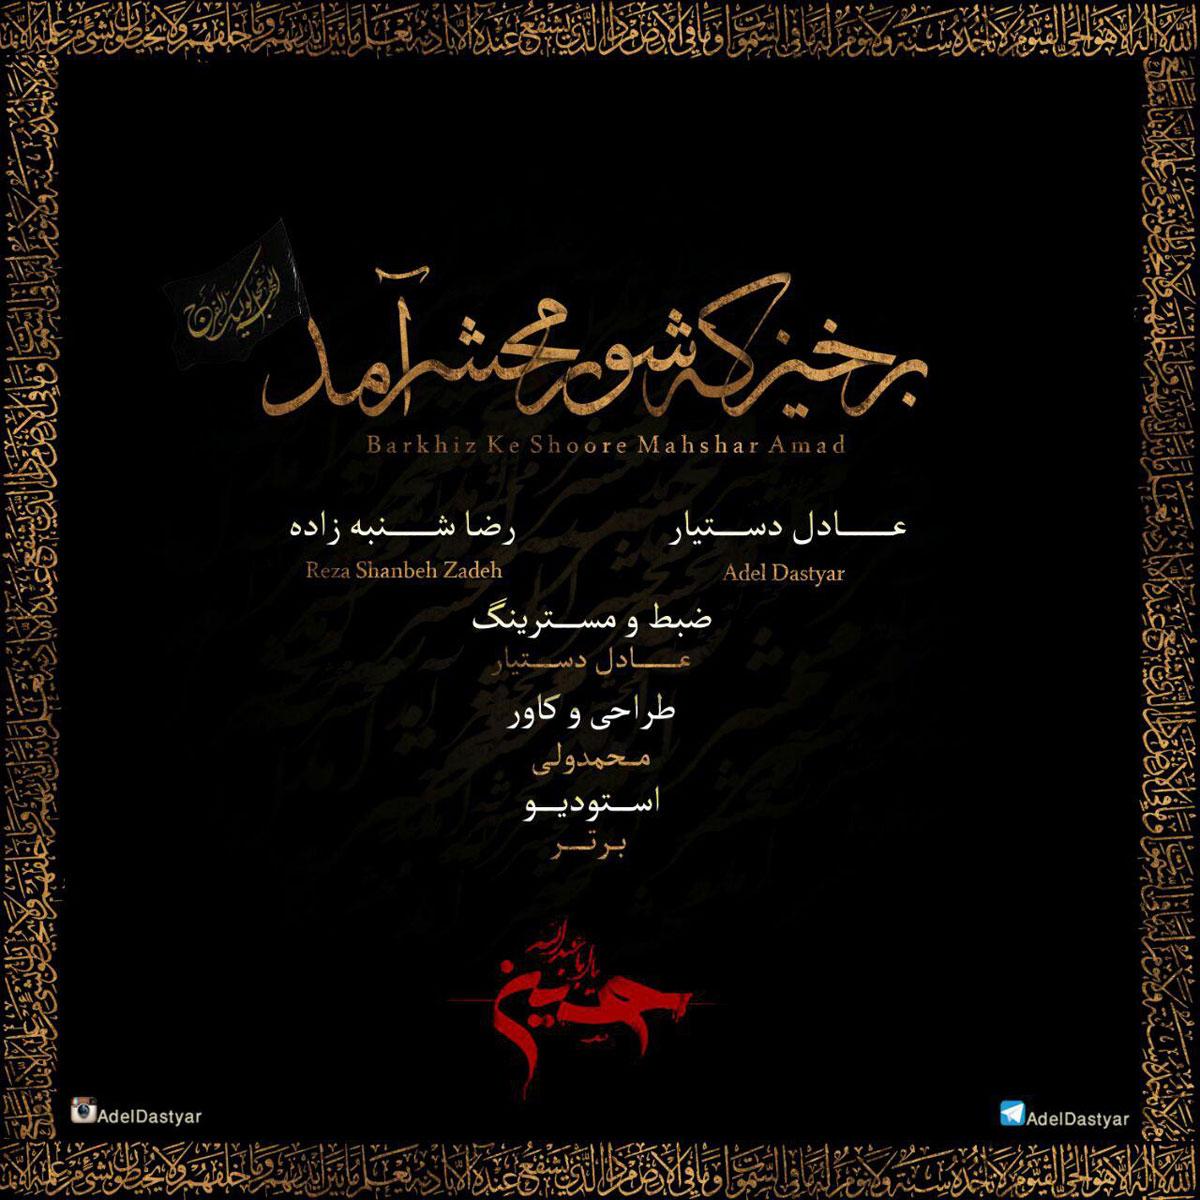 adel dastyar&Reza Shanbeh Zadeh – Barkhiz Ke Shoore Mahshar Amad